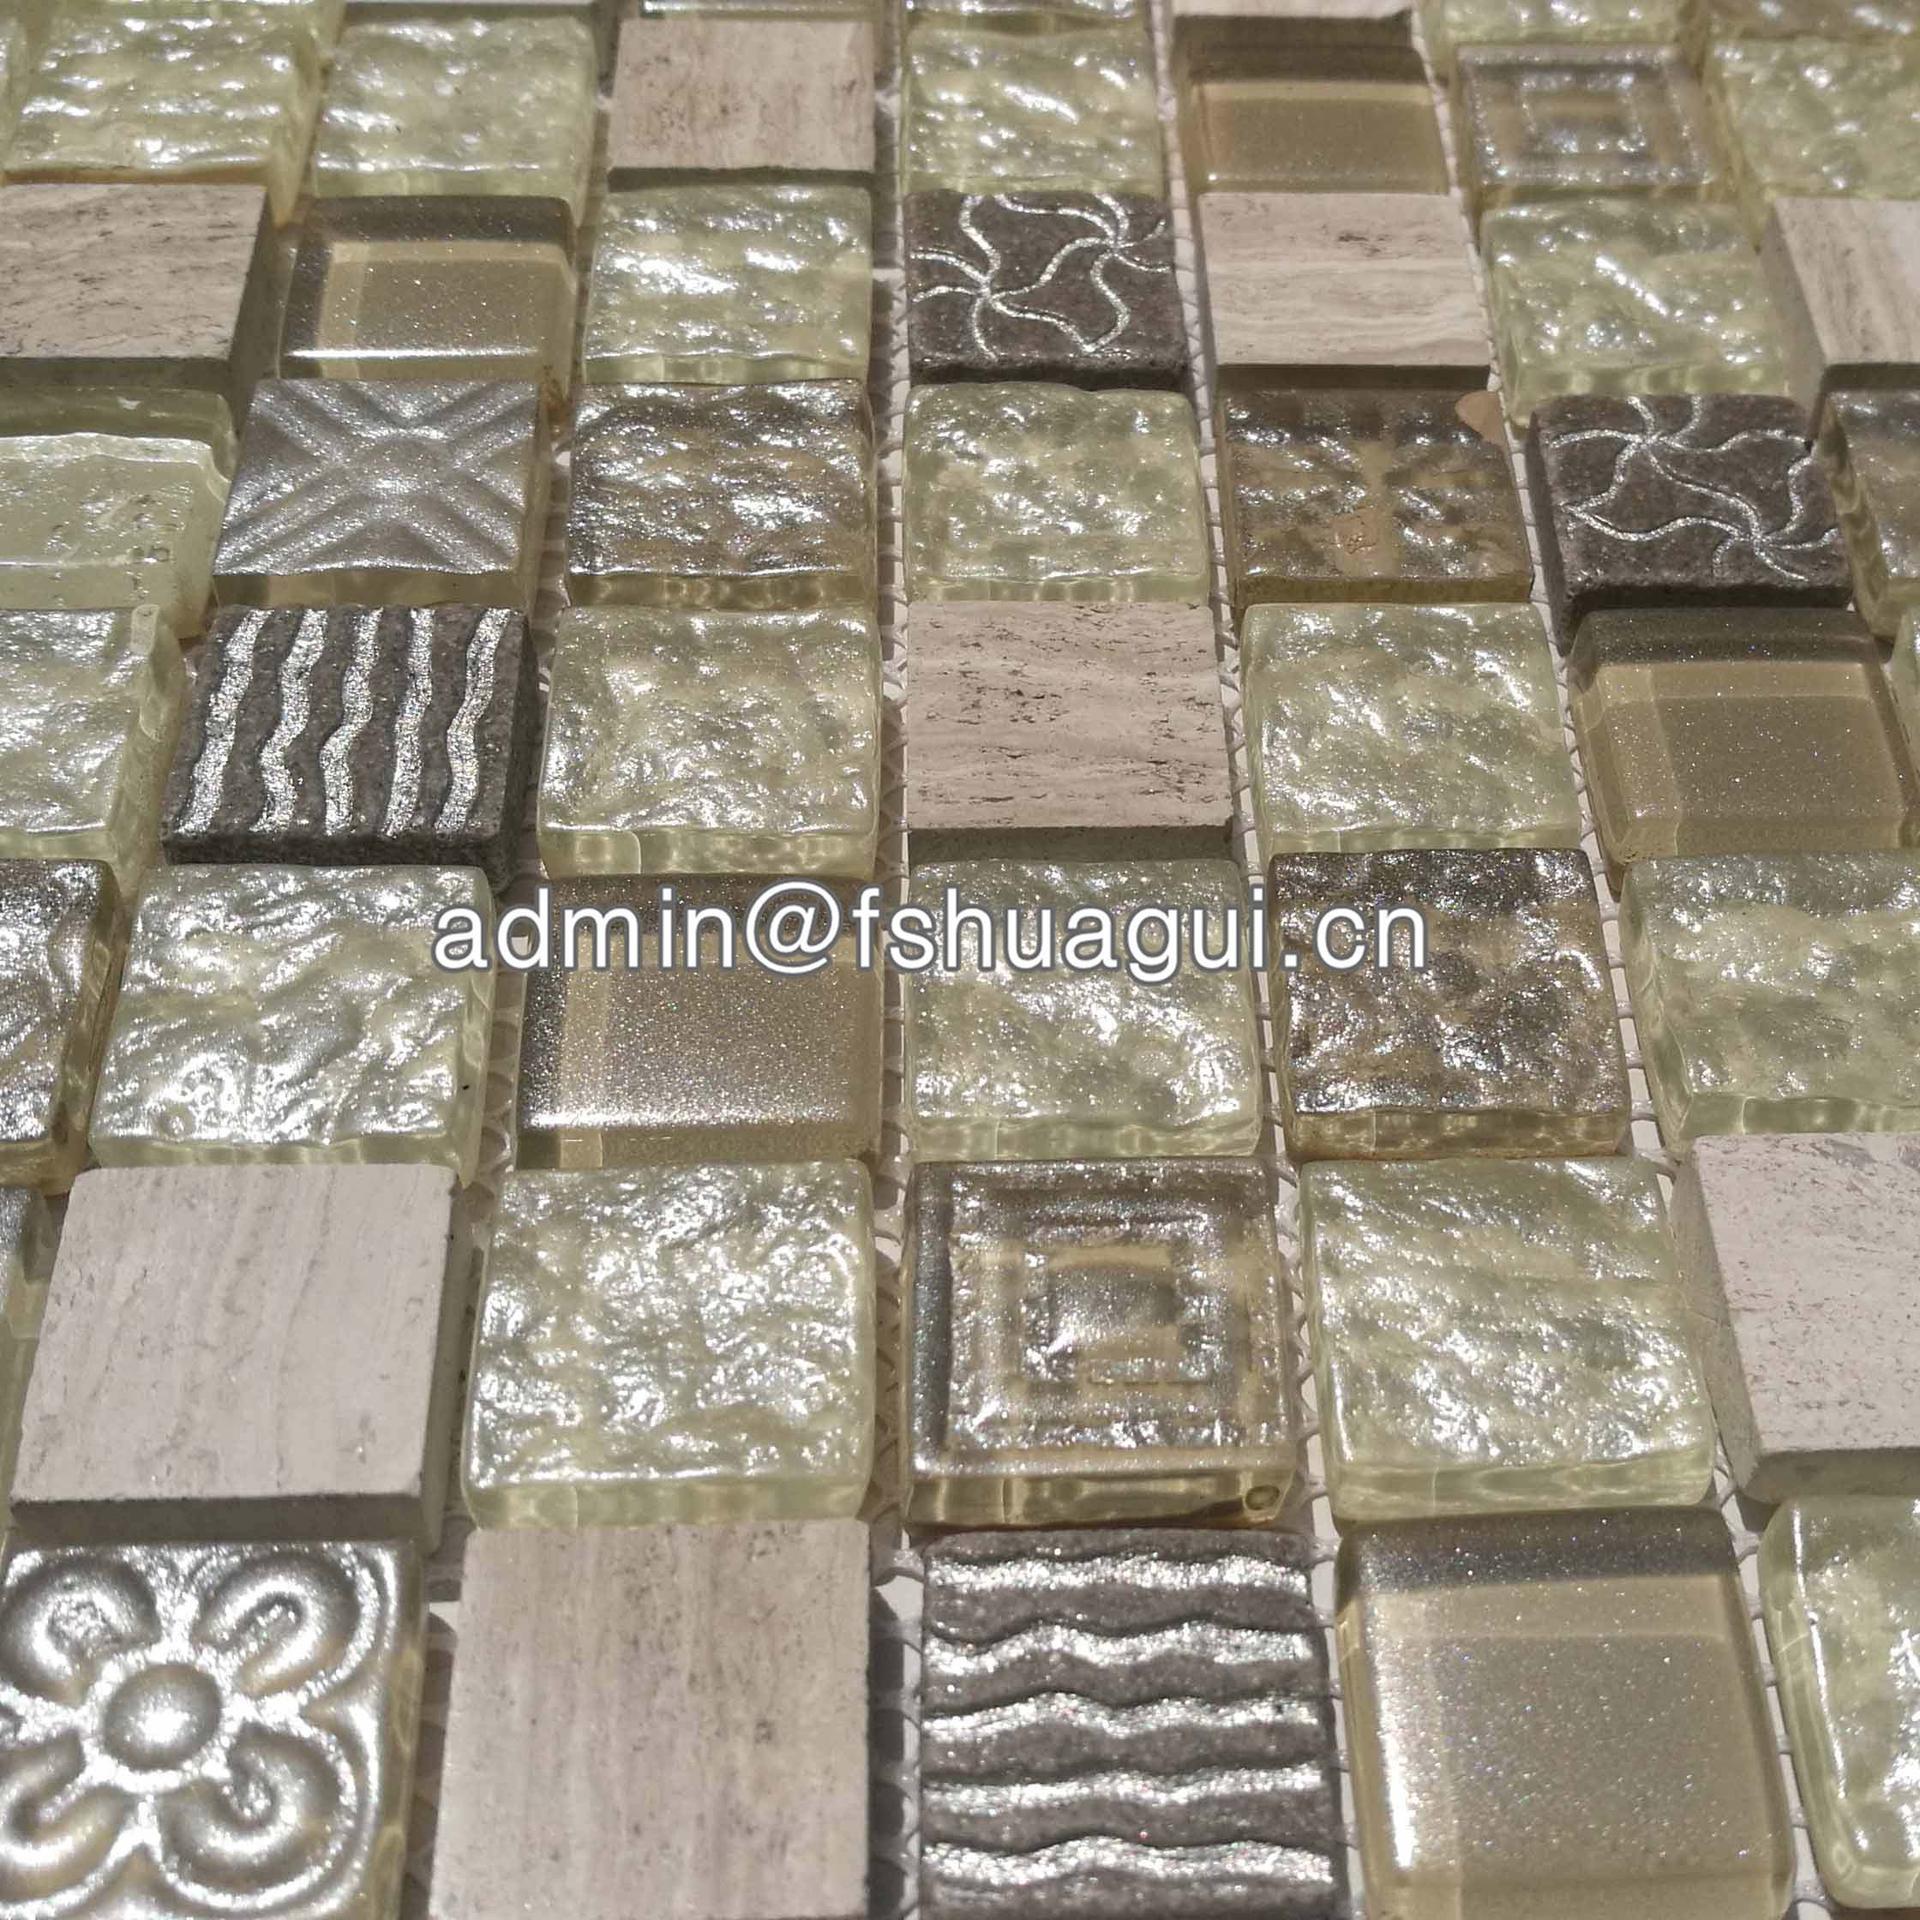 Factory 300 x 300 beige mix crystal glass mosaic tile 8mm HG-WJ420